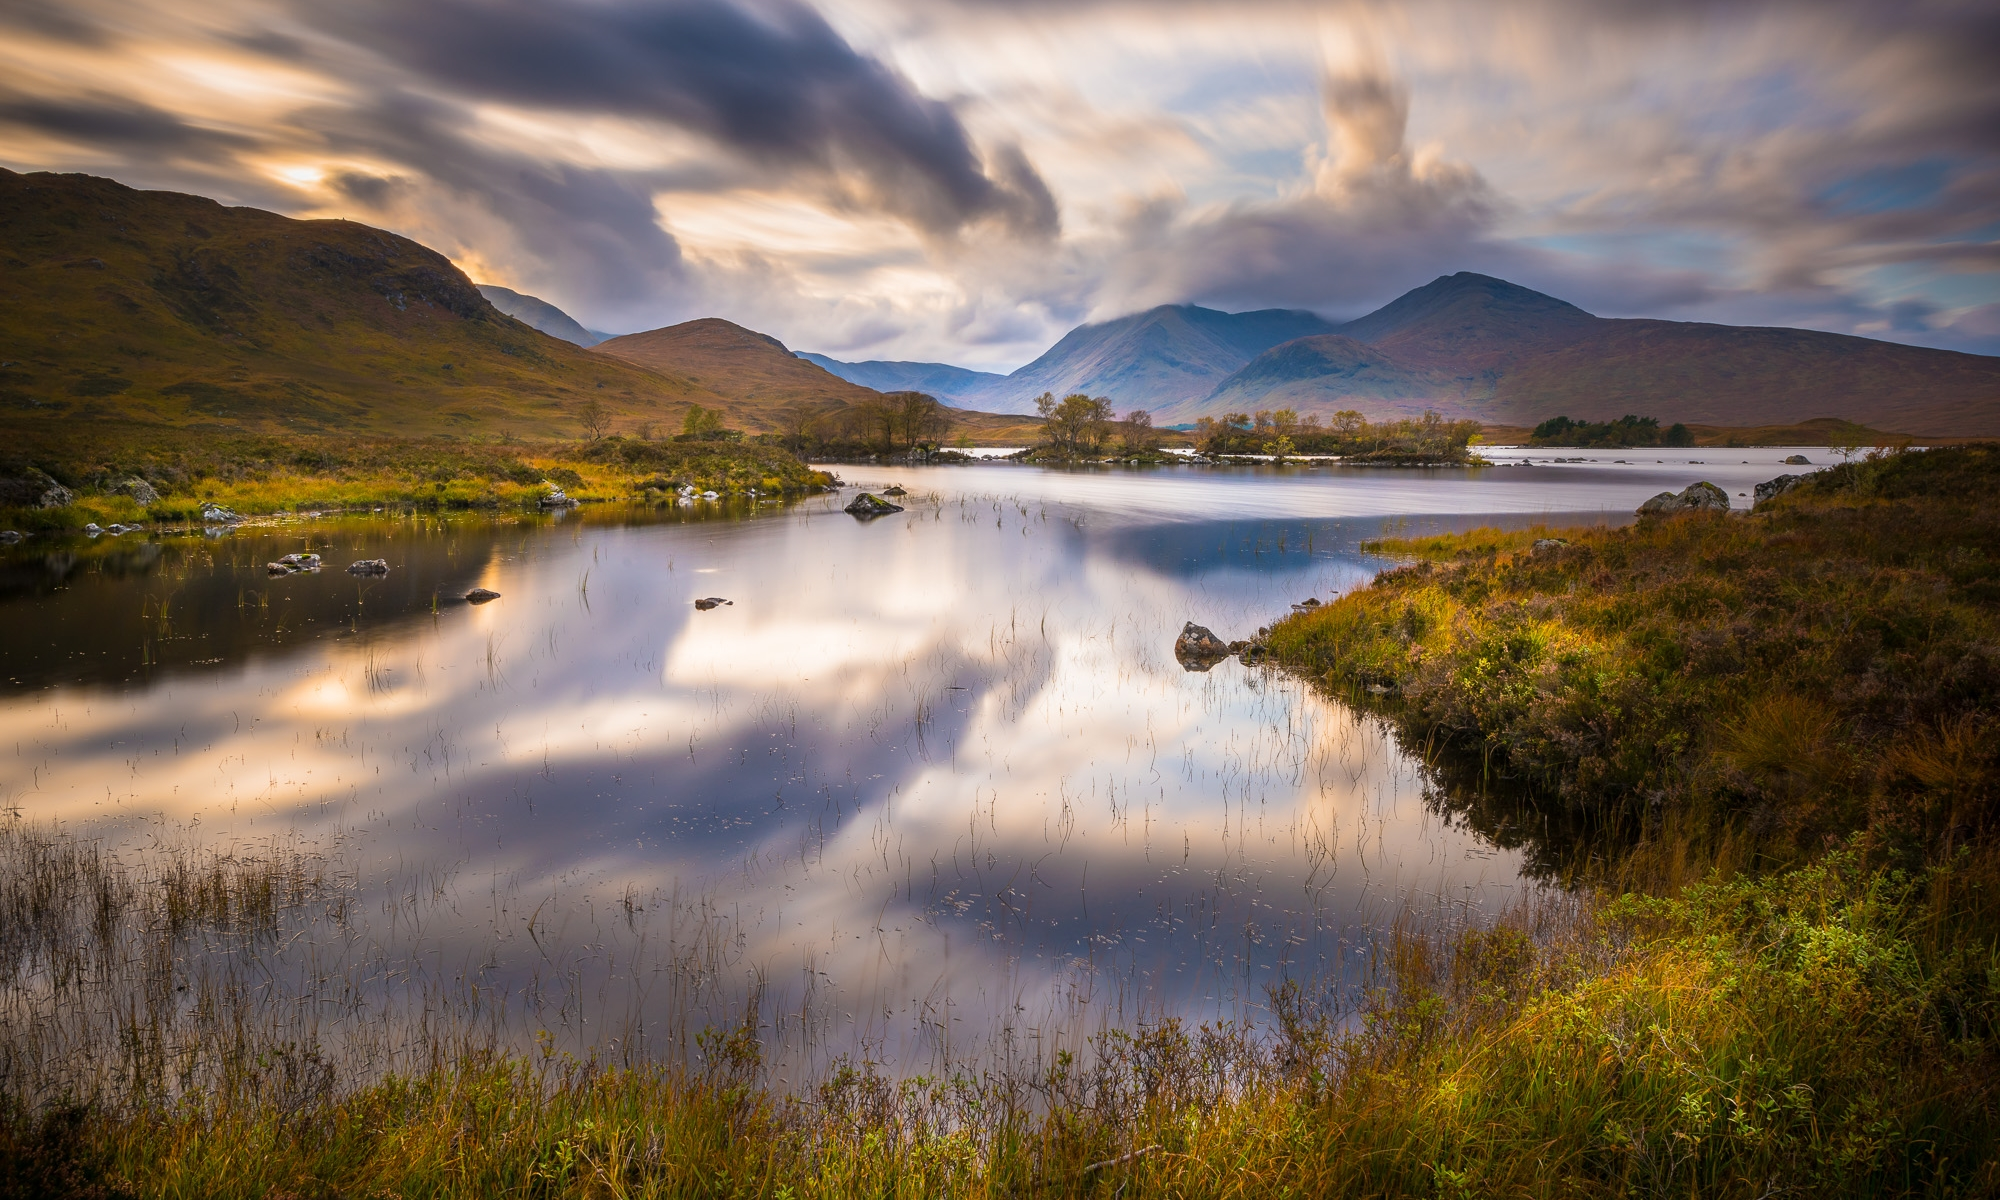 stunningly beautiful landscapes